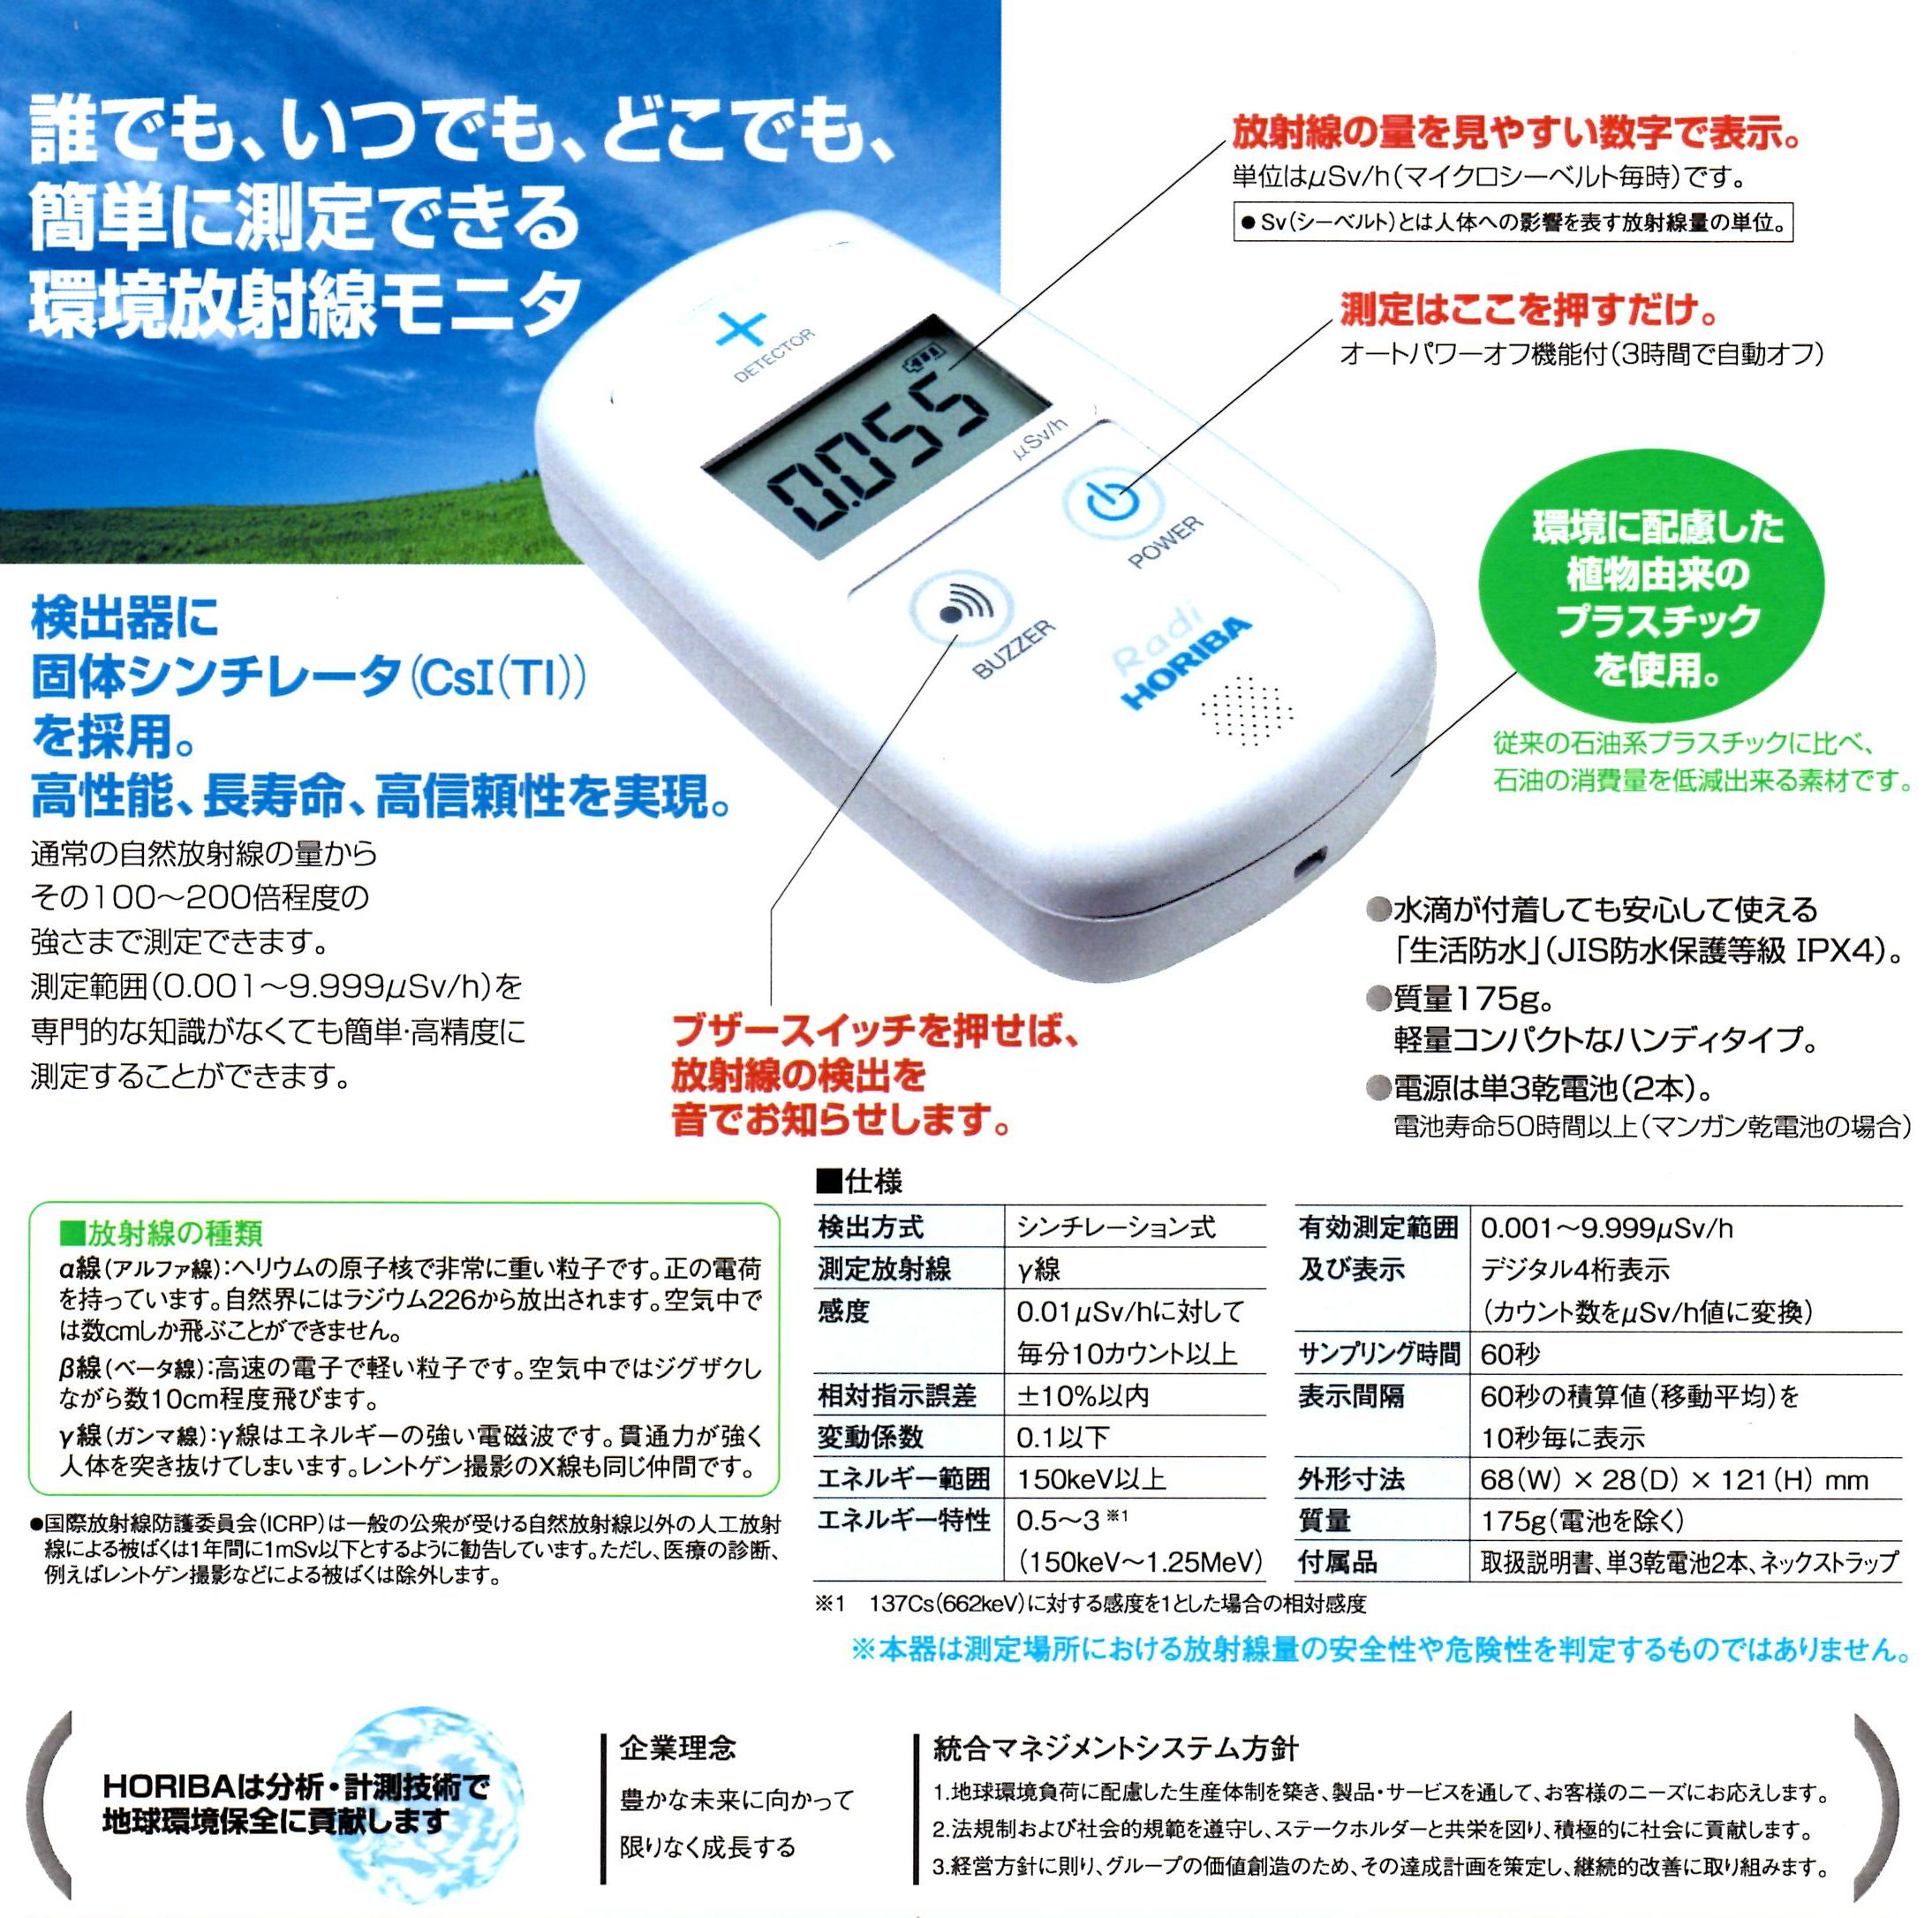 HORIBA 環境放射線モニタ PA-1000 Radi(ラディ)